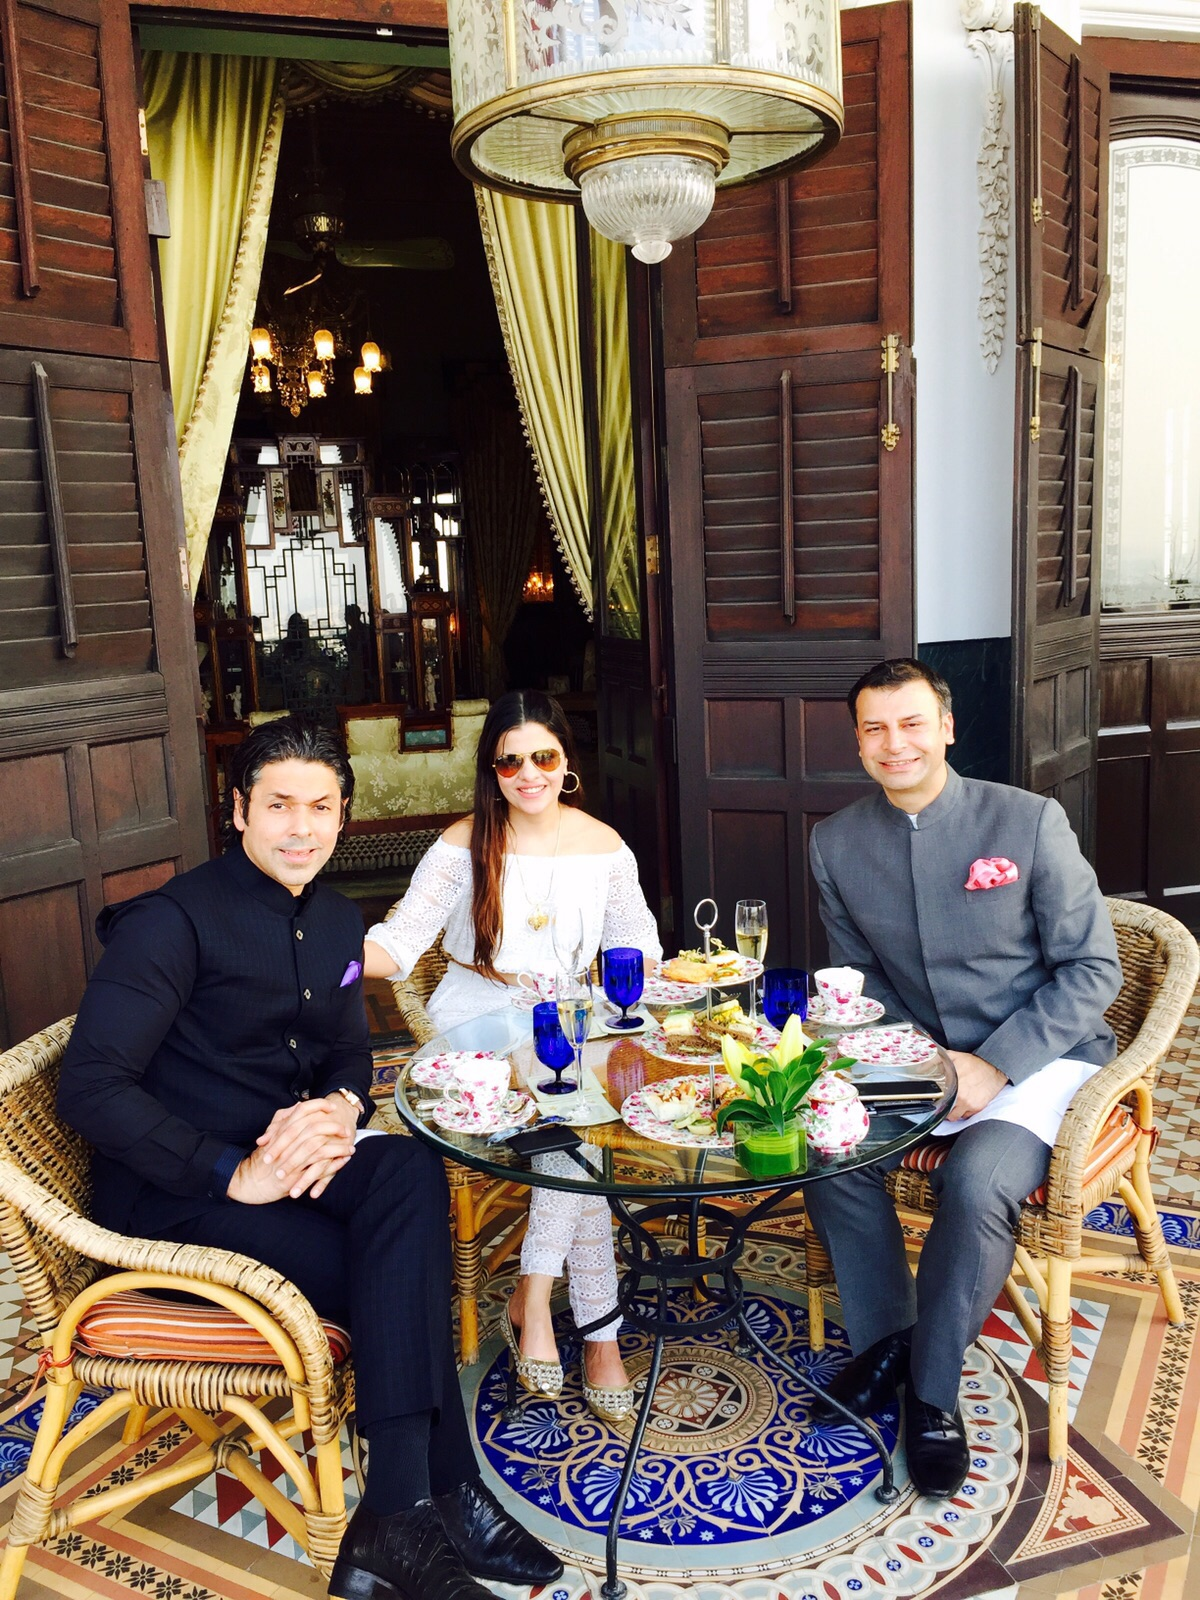 mohammed faiz - taj falaknuma, luxury hotel Hyderabad, luxury palace hyderabad, Taj Falaknuma Palace Hyderabad, taj hotel hyderabad,